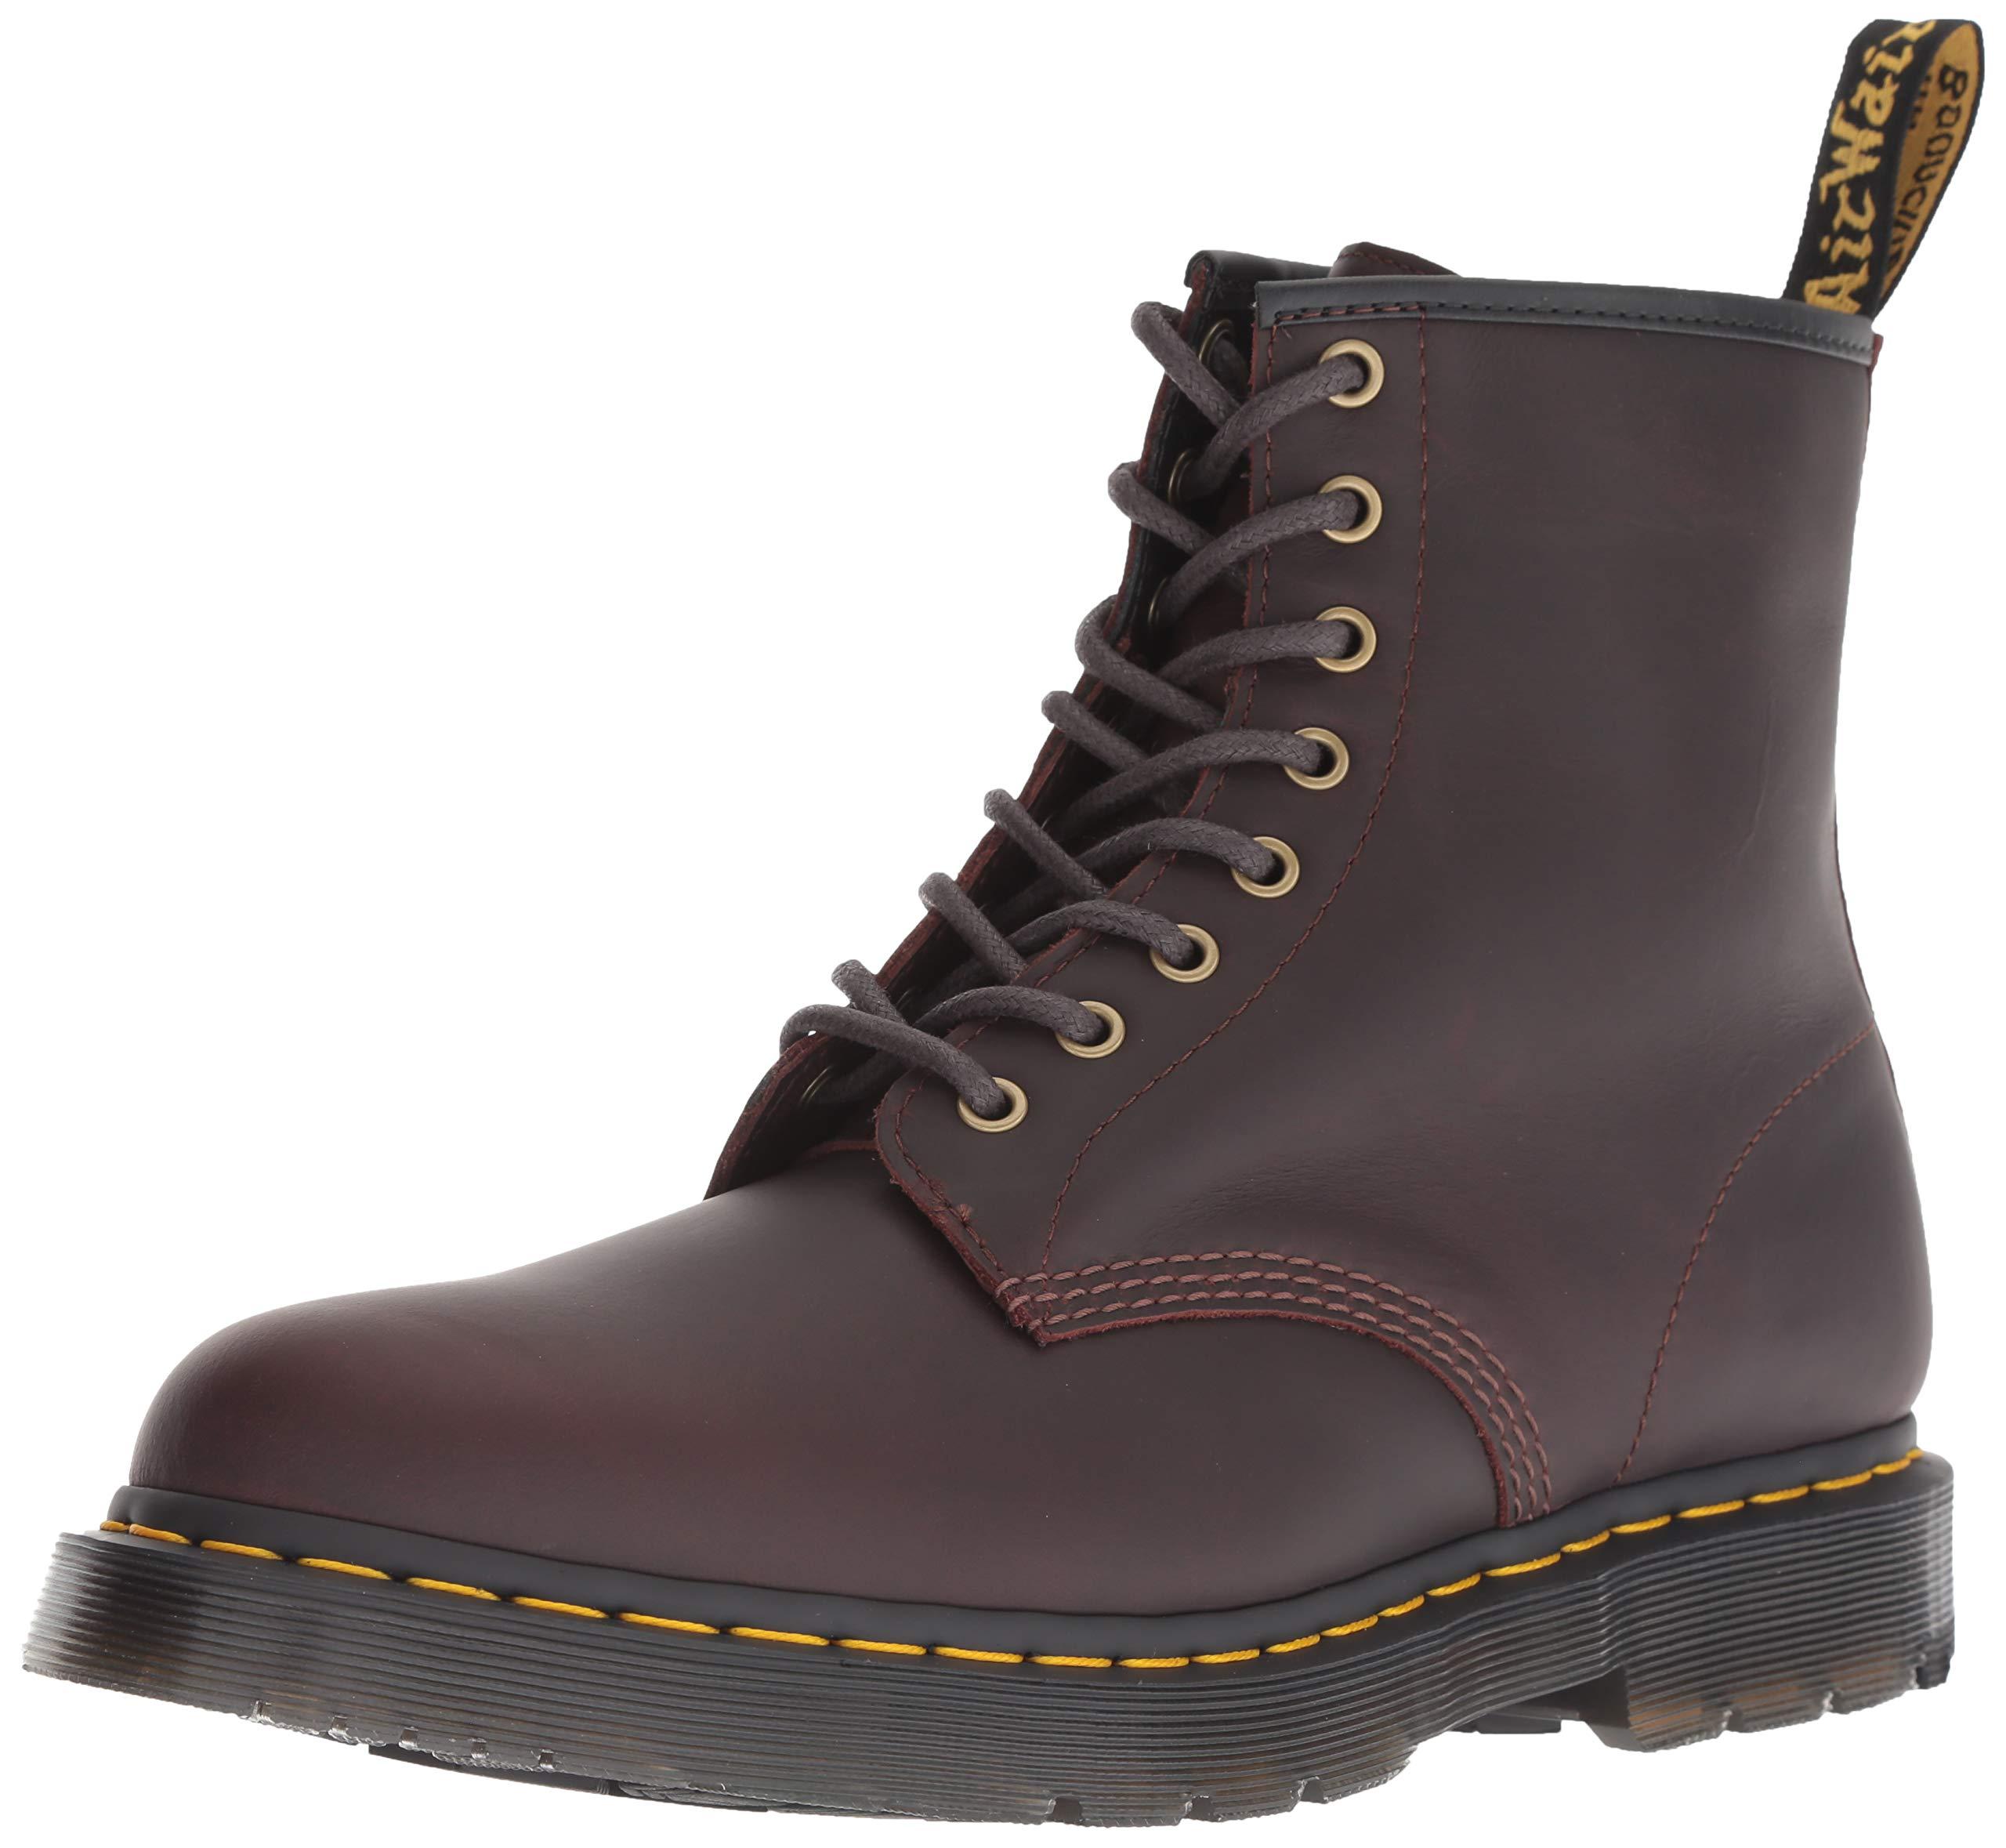 Dr. Martens Men's 1460 Snow Boot, Cocoa, 9 Medium UK (10 US) by Dr. Martens